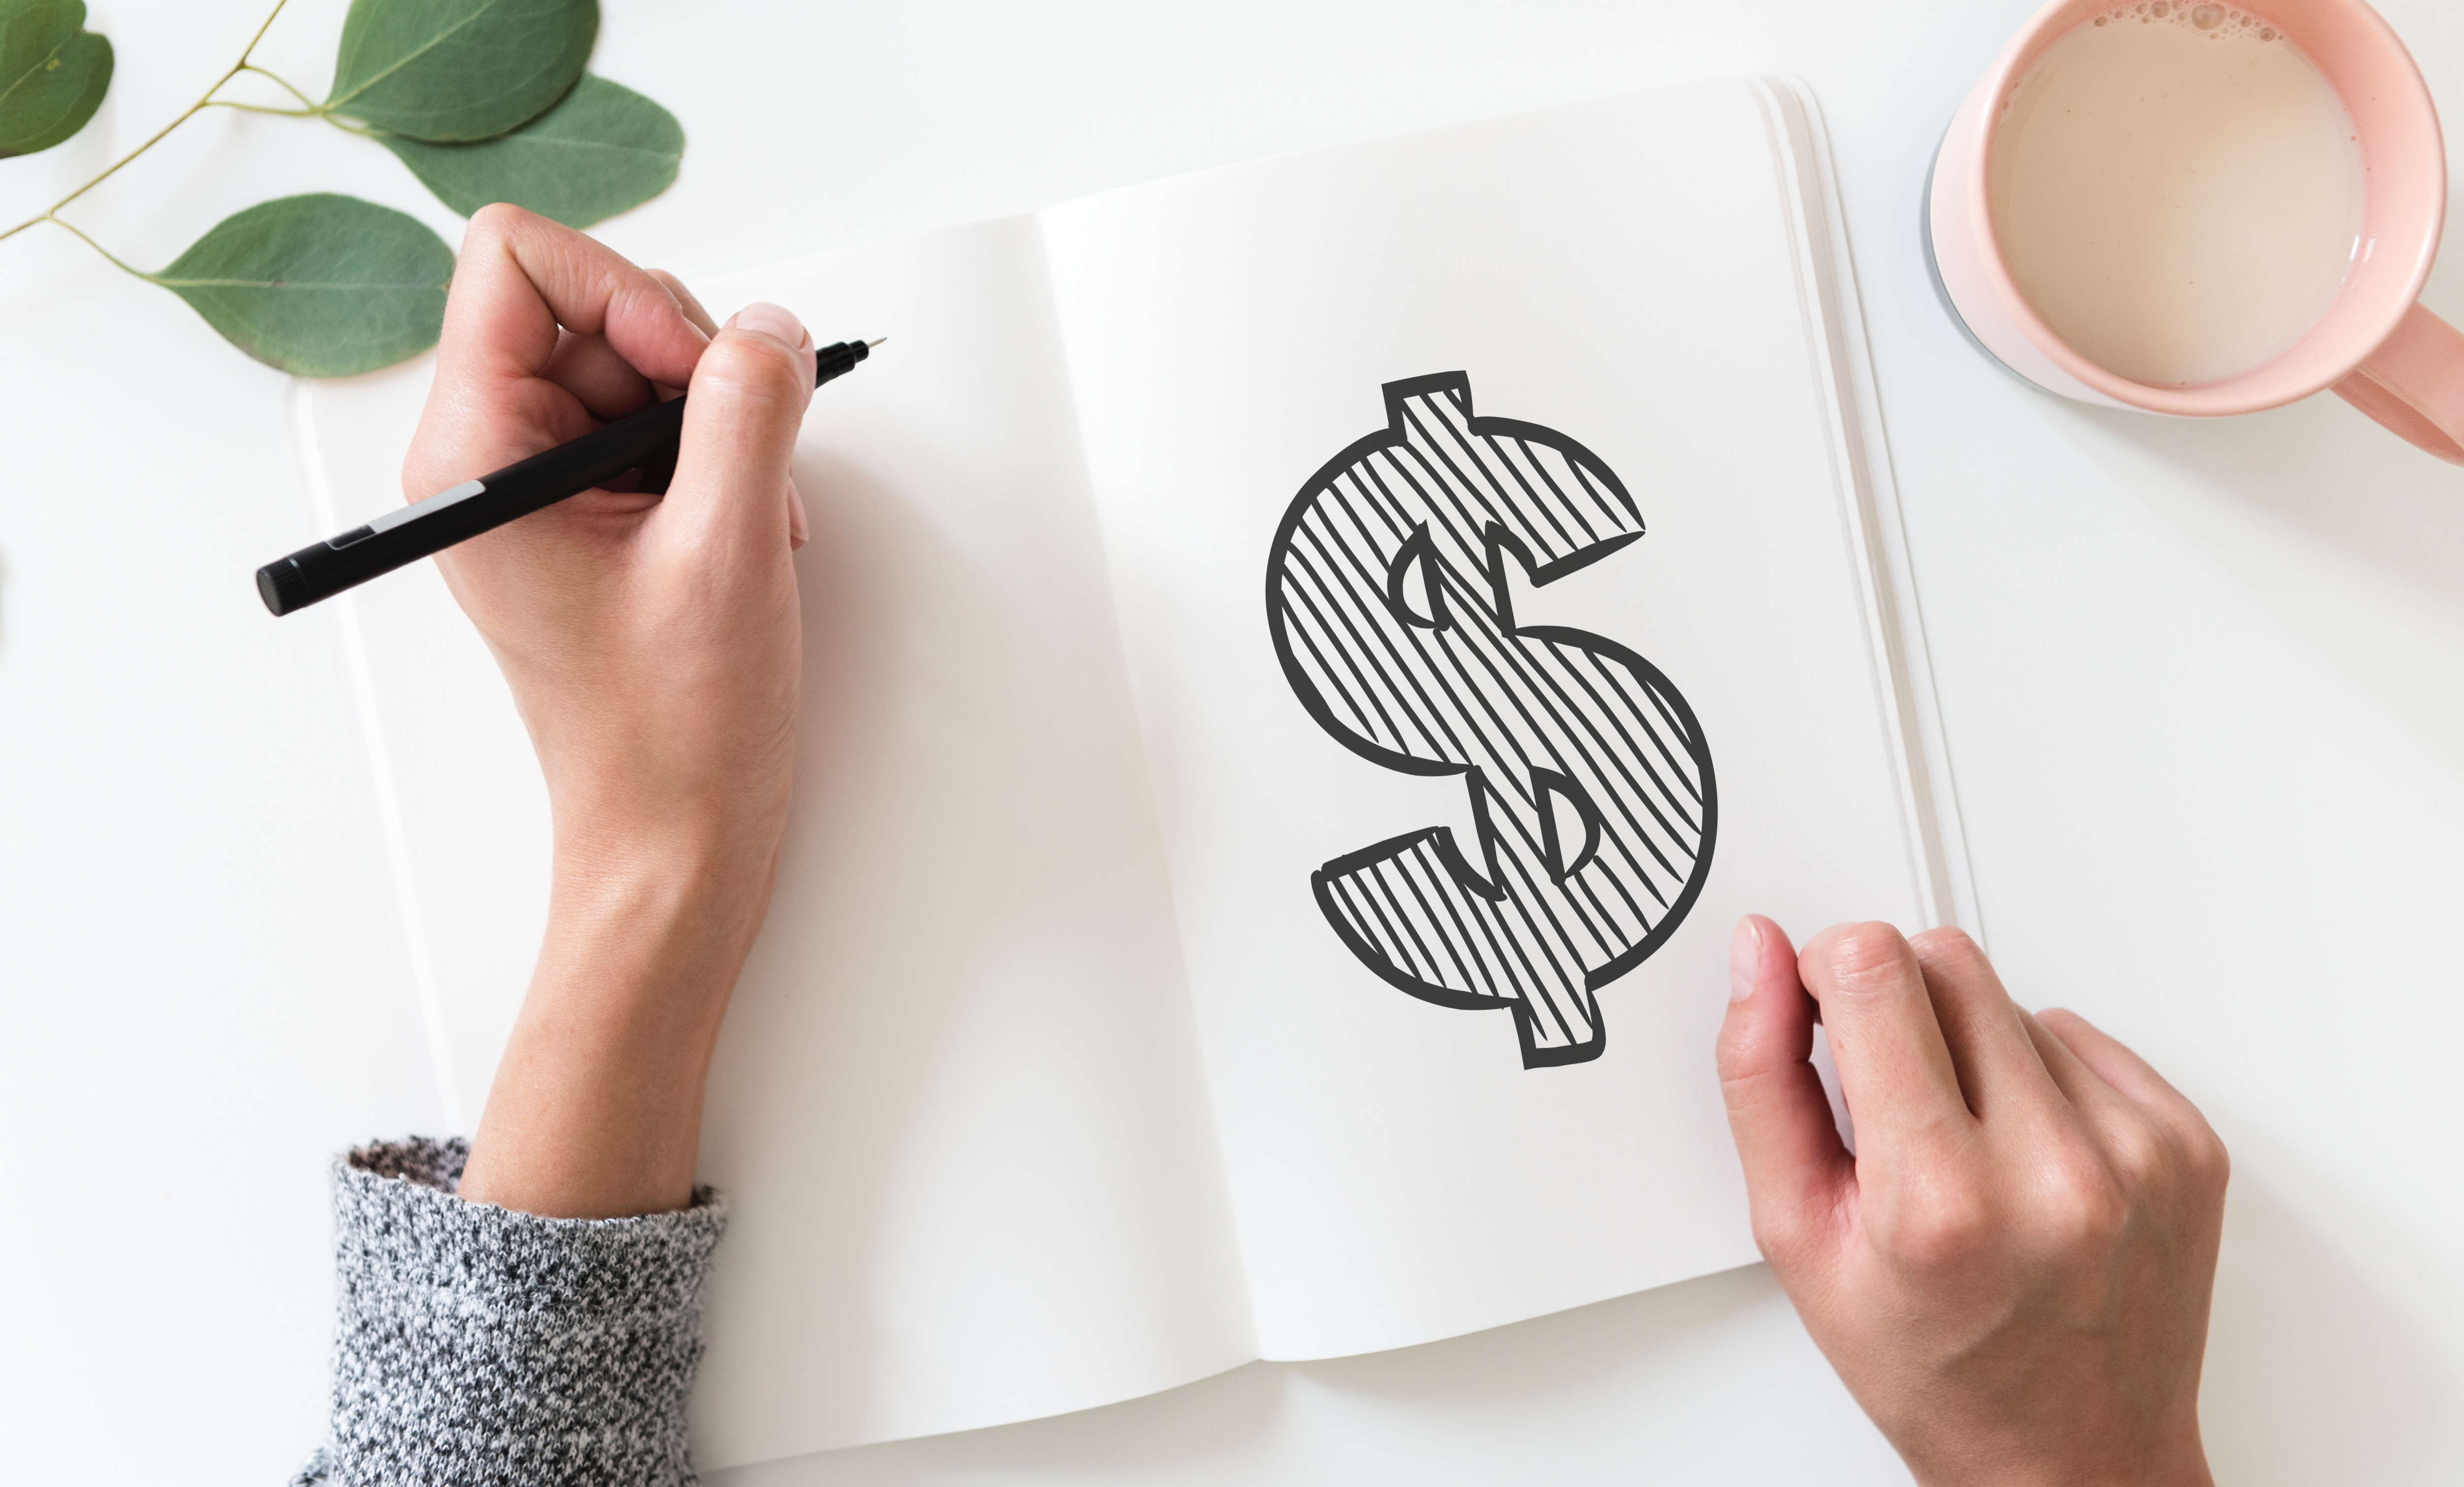 Advising Money